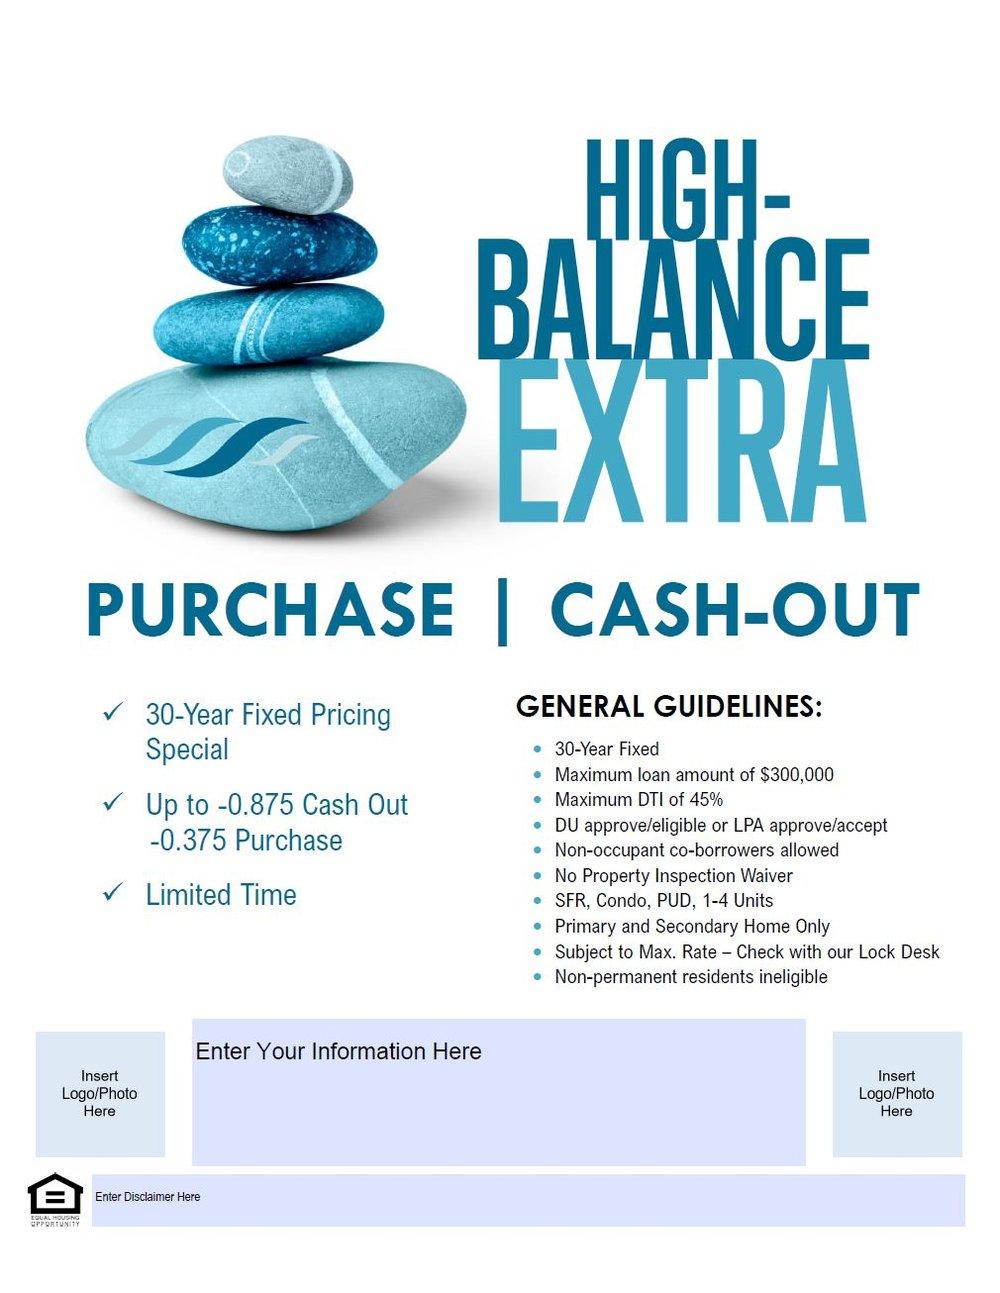 High-Balance Extra Marketing Flyer 10.18 Broker Fillable.JPG